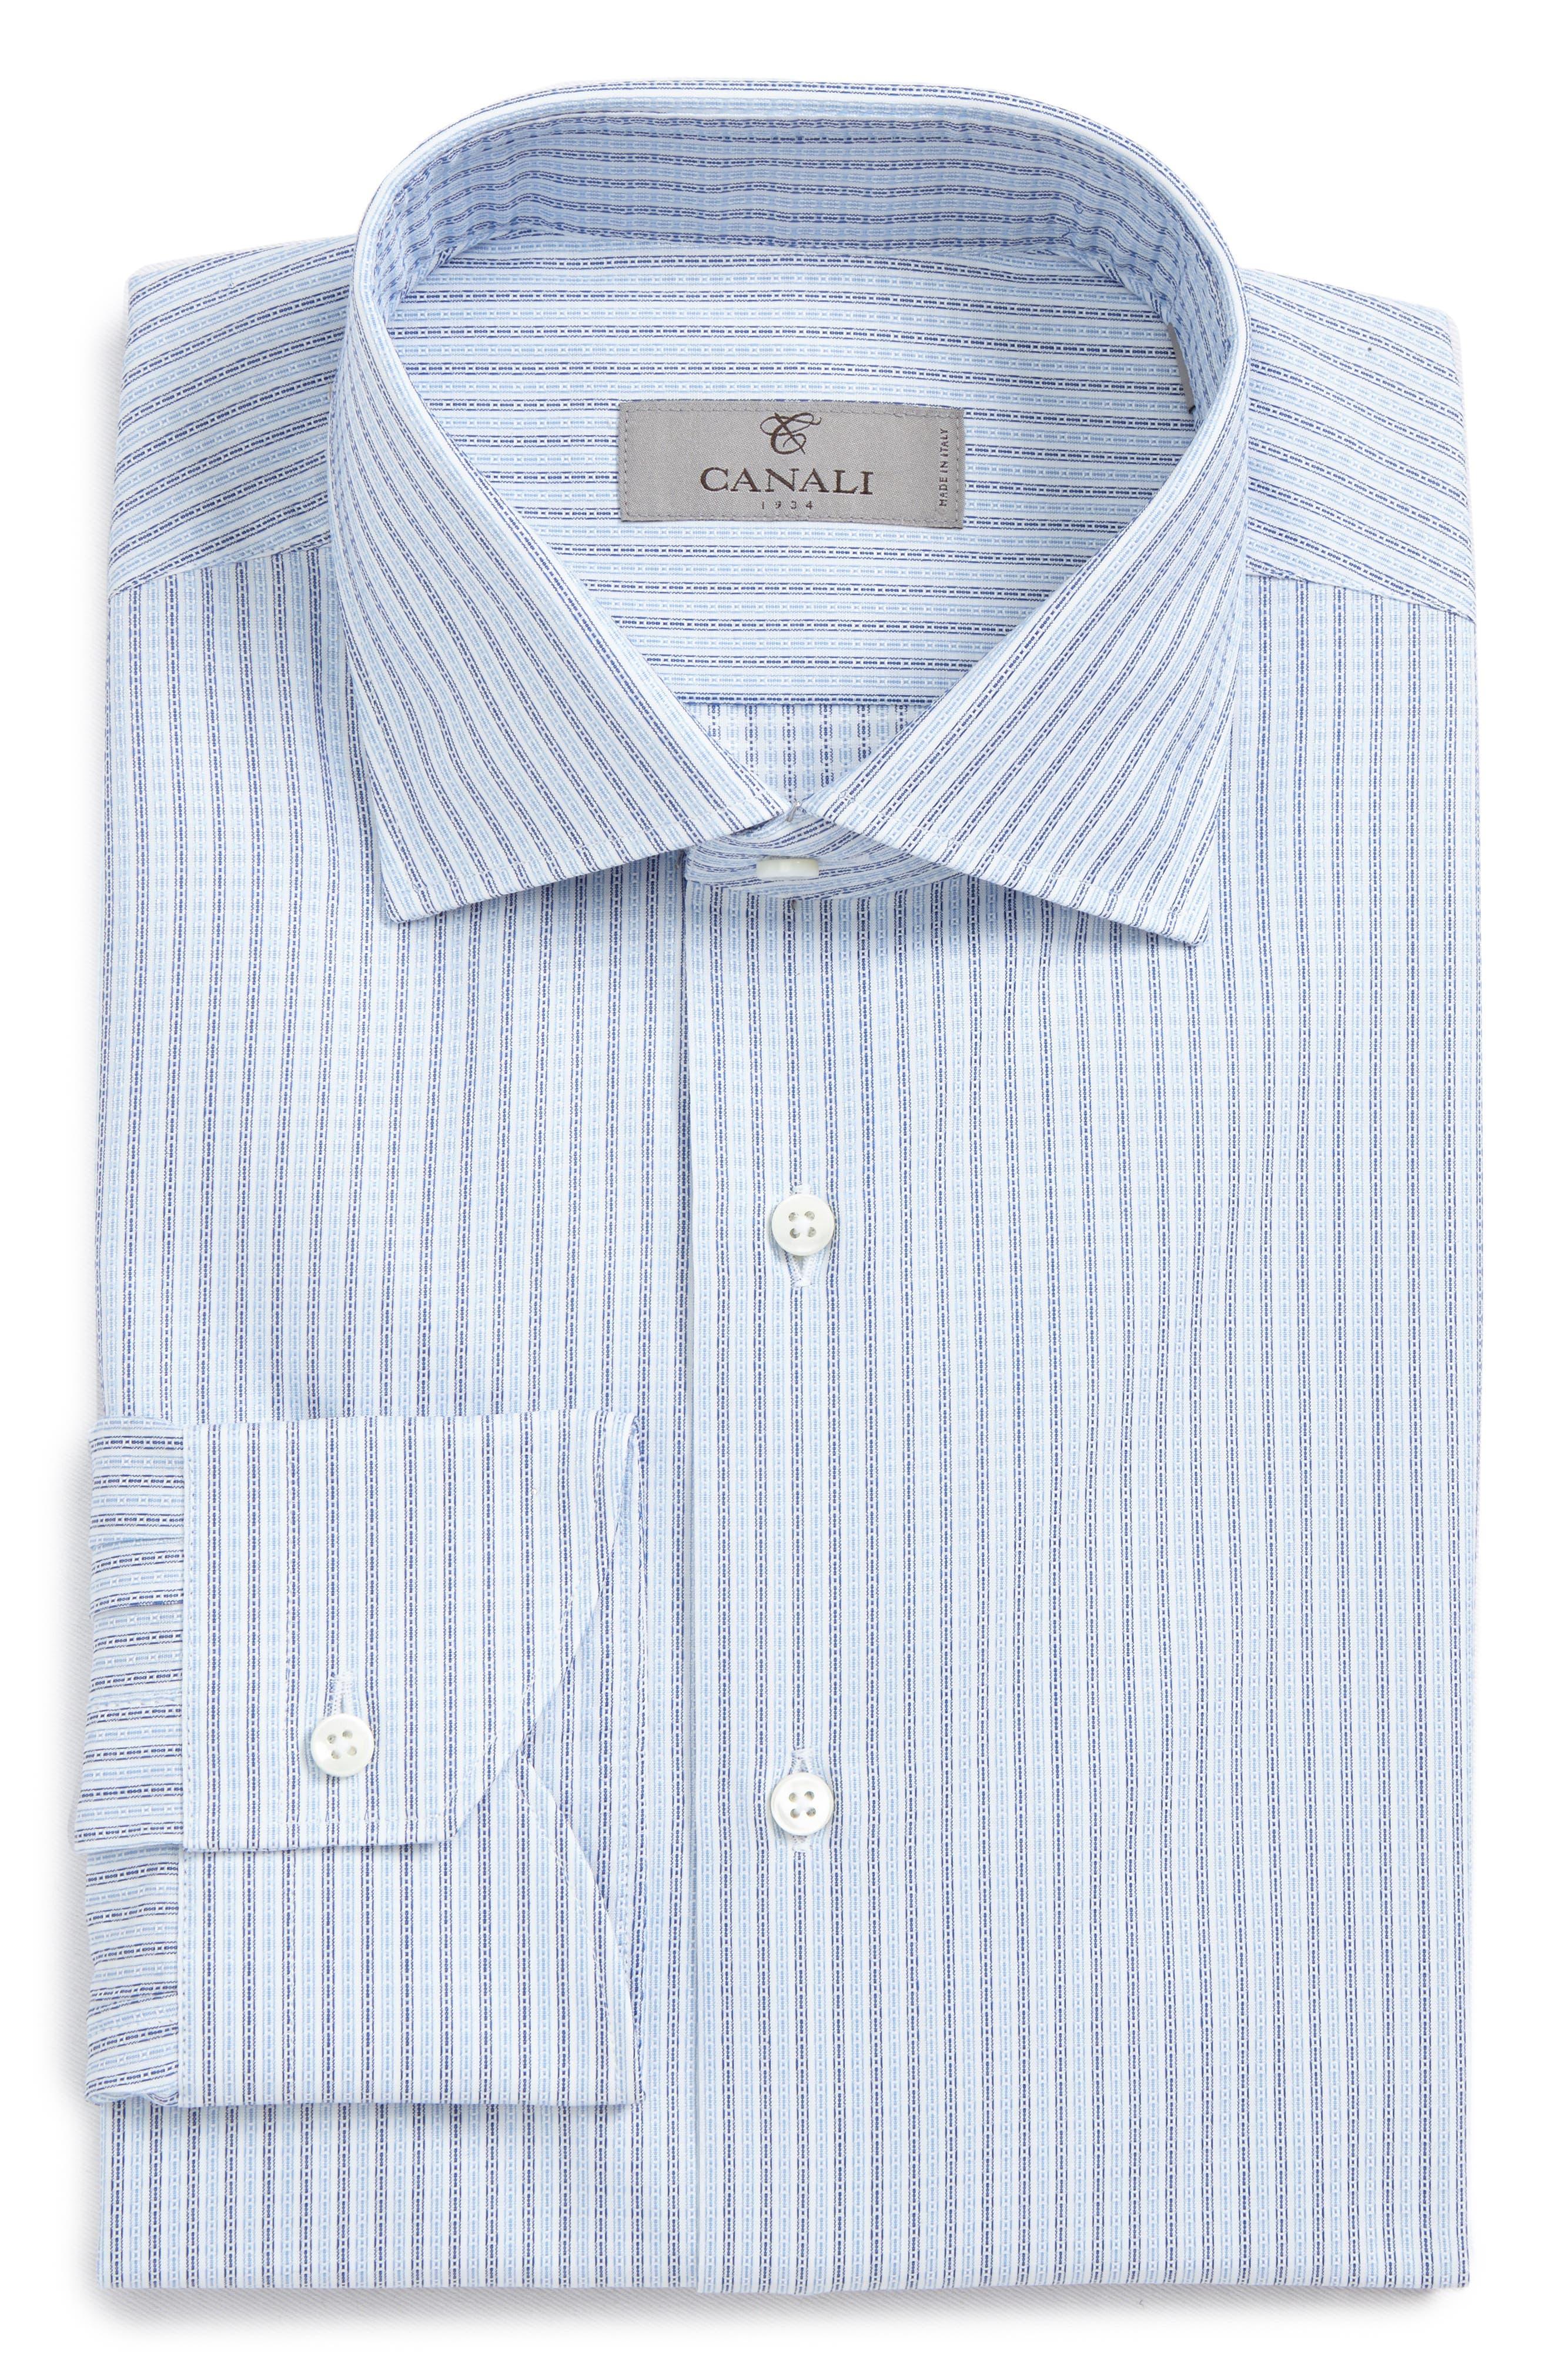 Regular Fit Geometric Dress Shirt,                         Main,                         color, 420